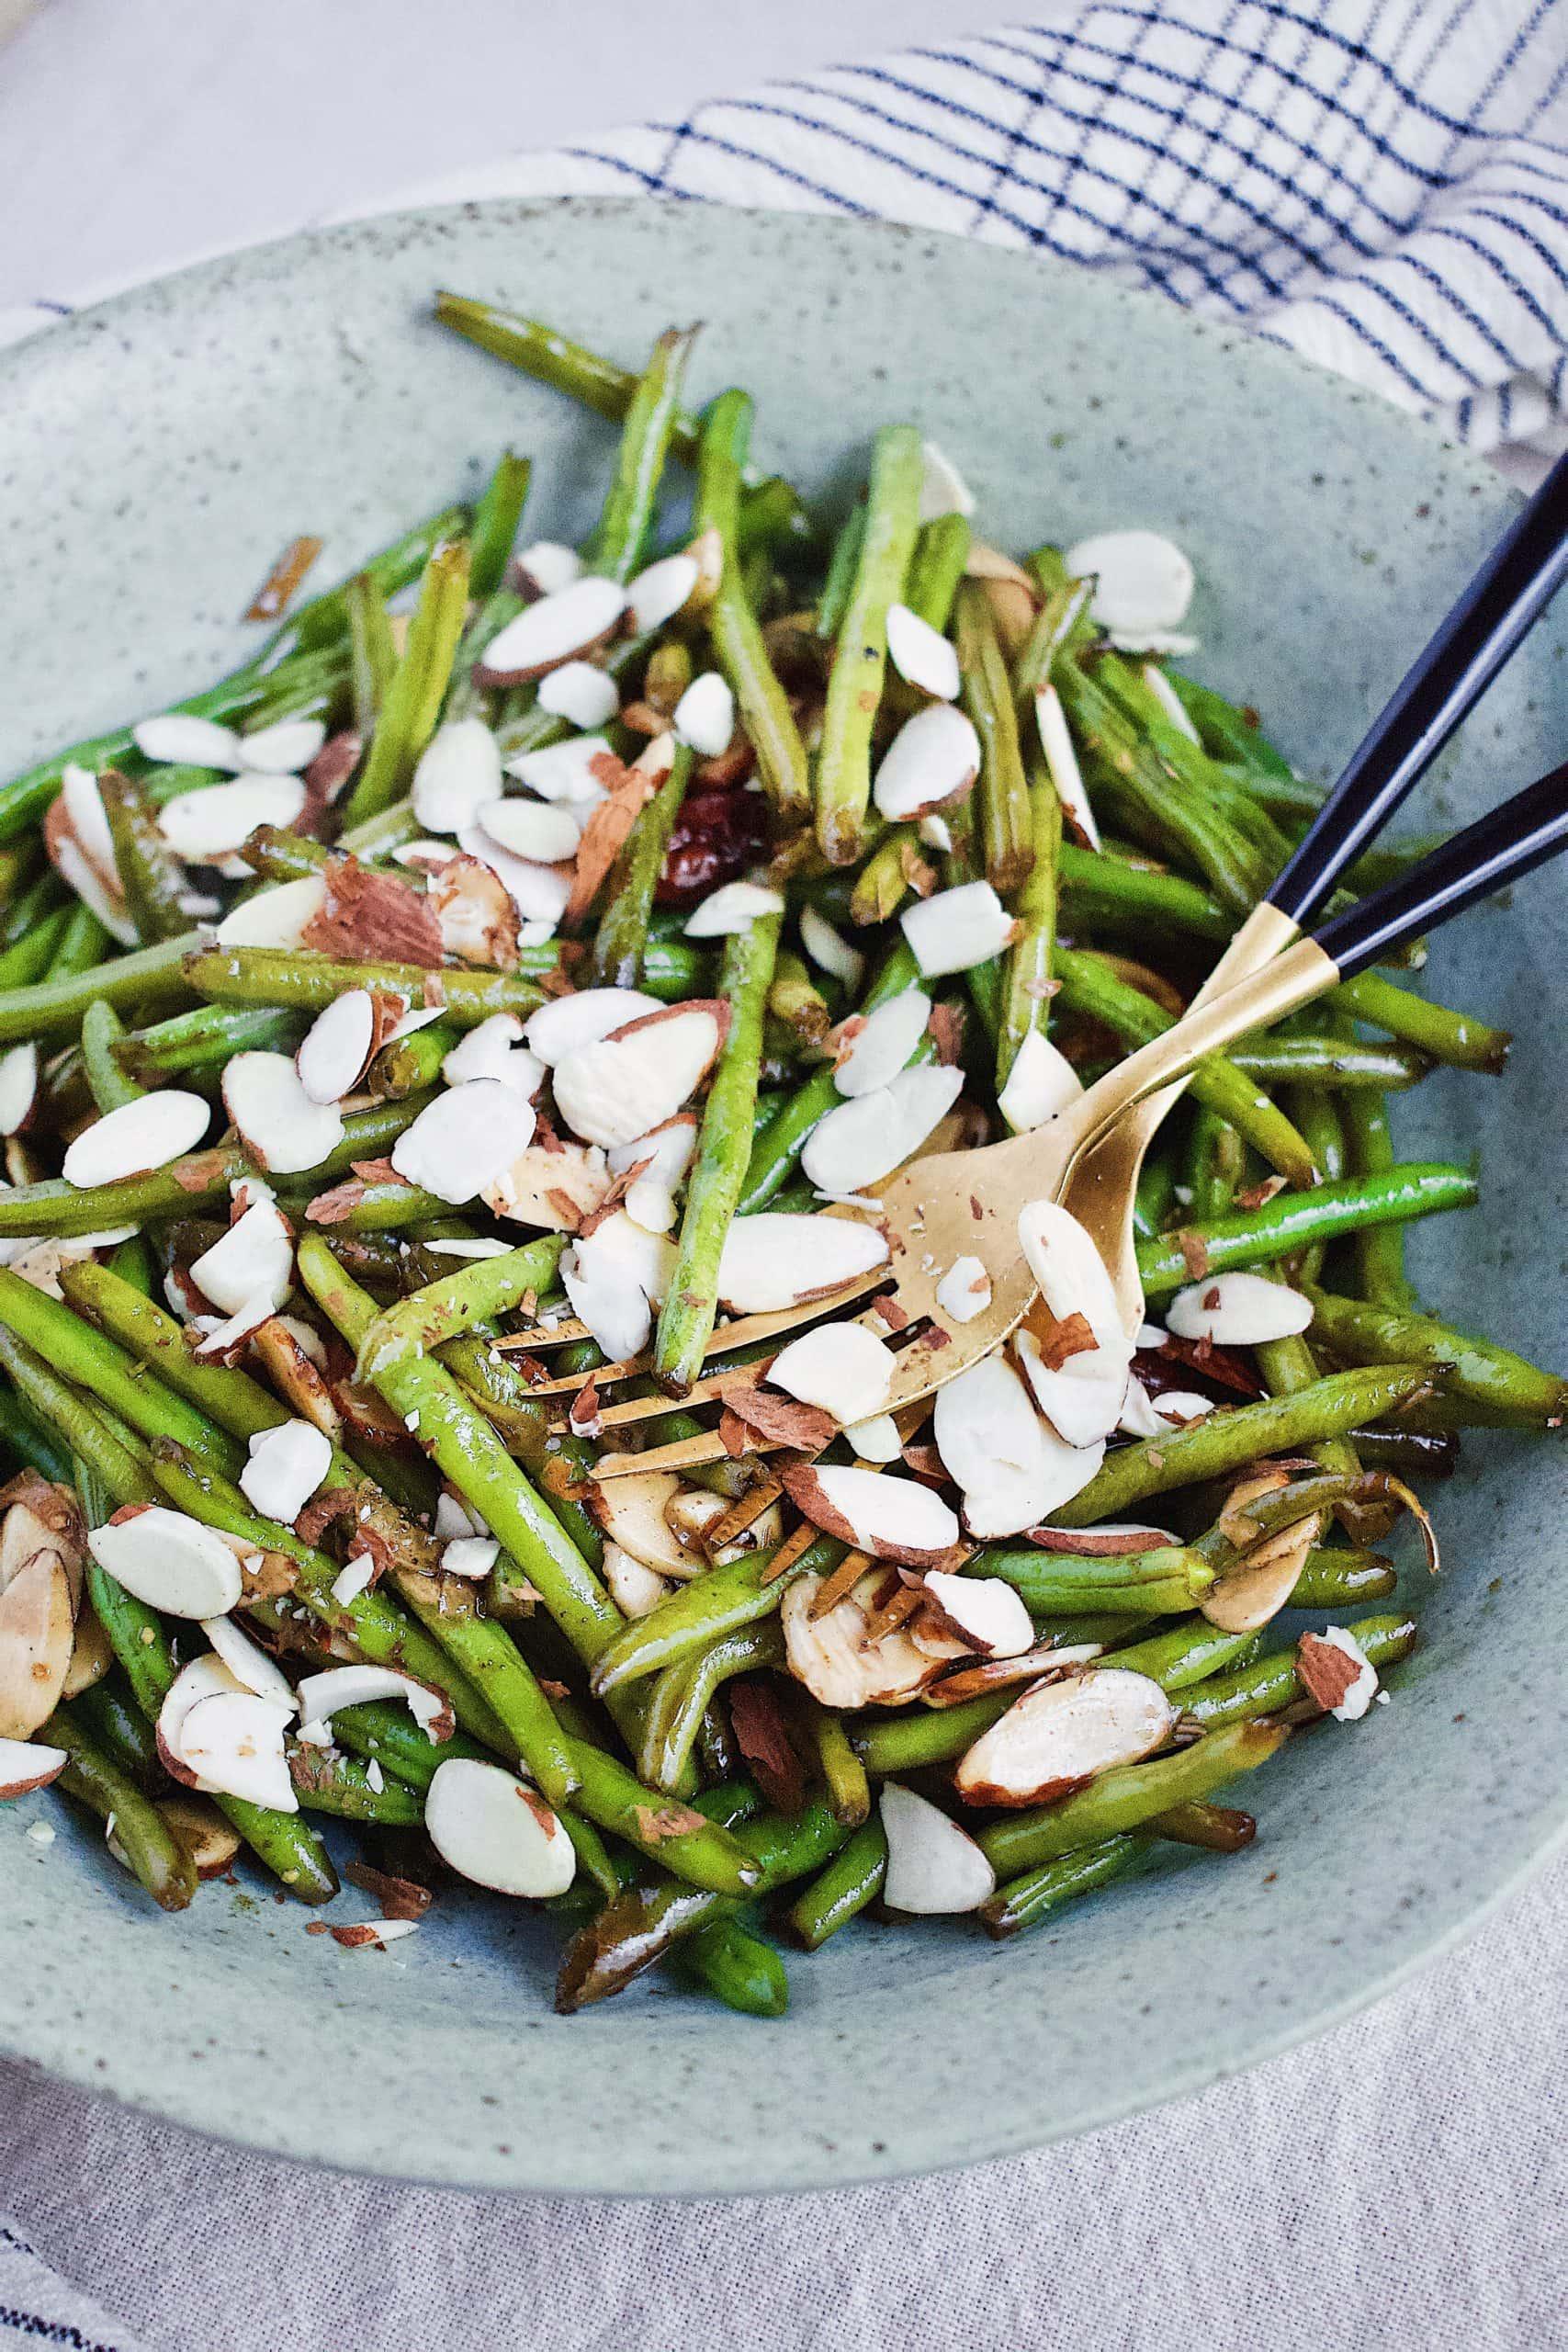 Joanna Gaines Green Beans Amandine